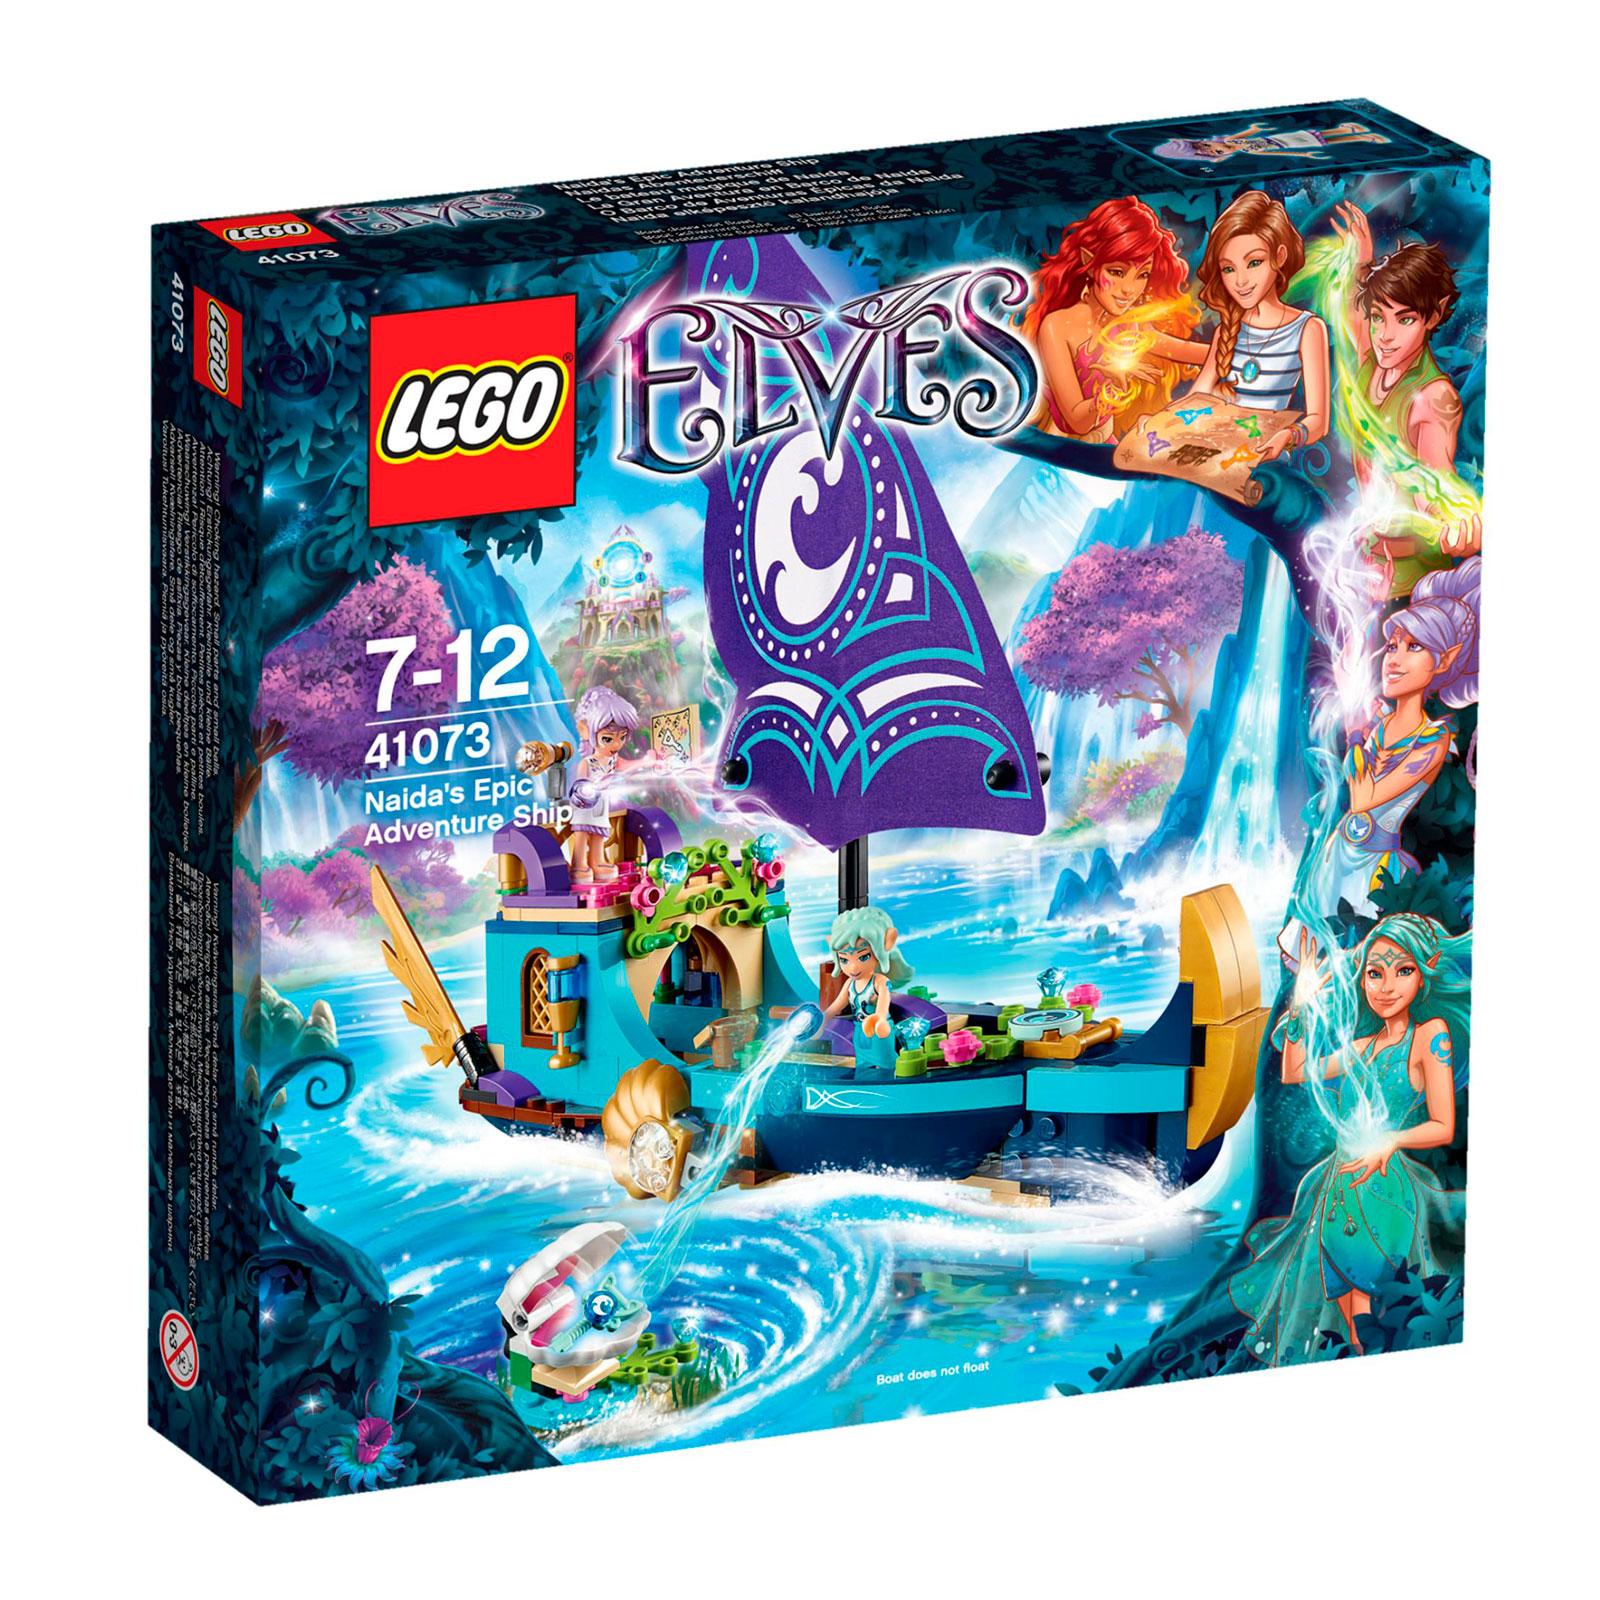 ����������� LEGO Elves 41073 ������� �����